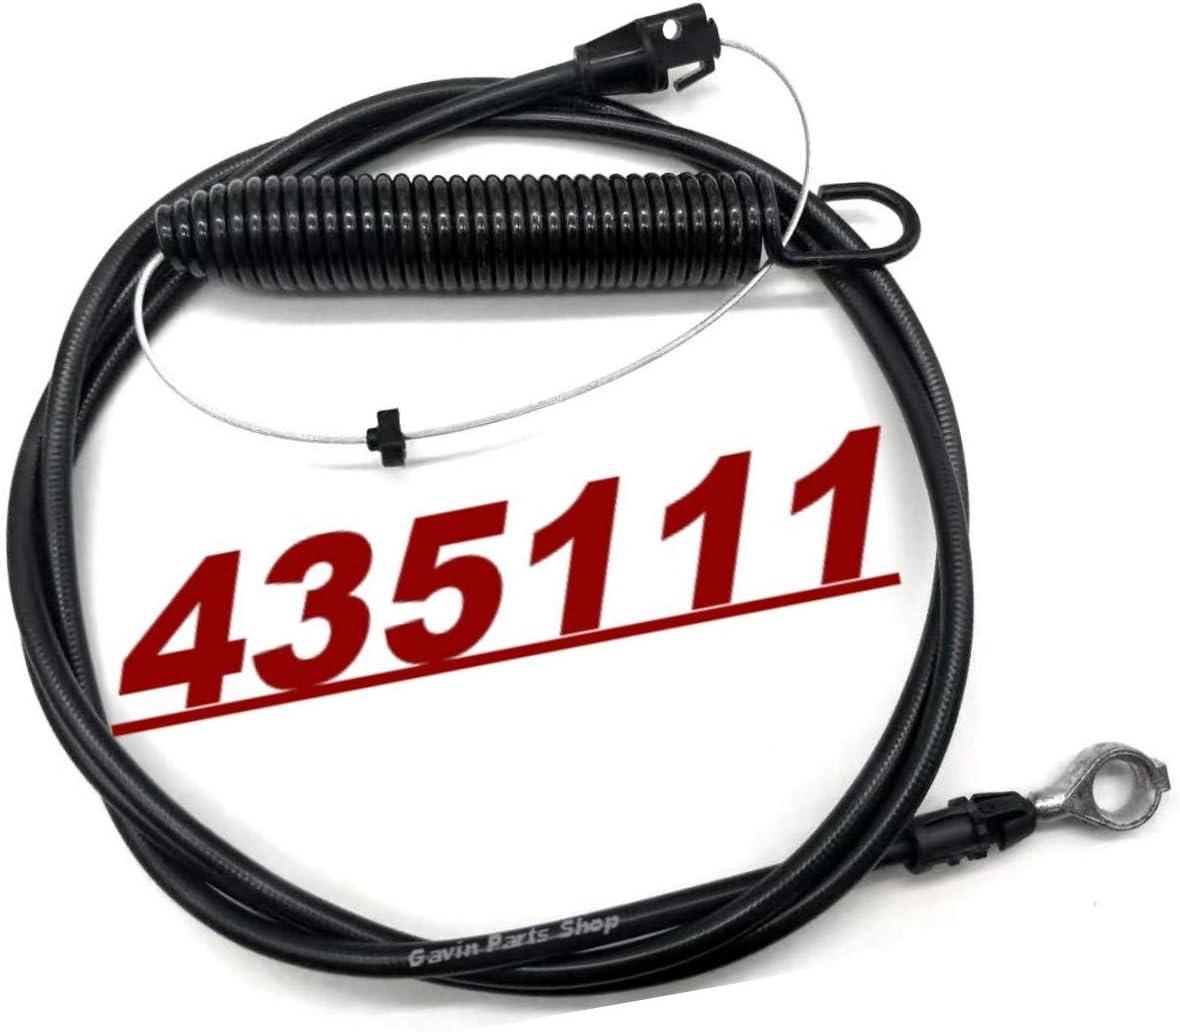 Deck Engagement Clutch Cable AYP Husqvarna Craftsman Poulan 435111 408714 197257